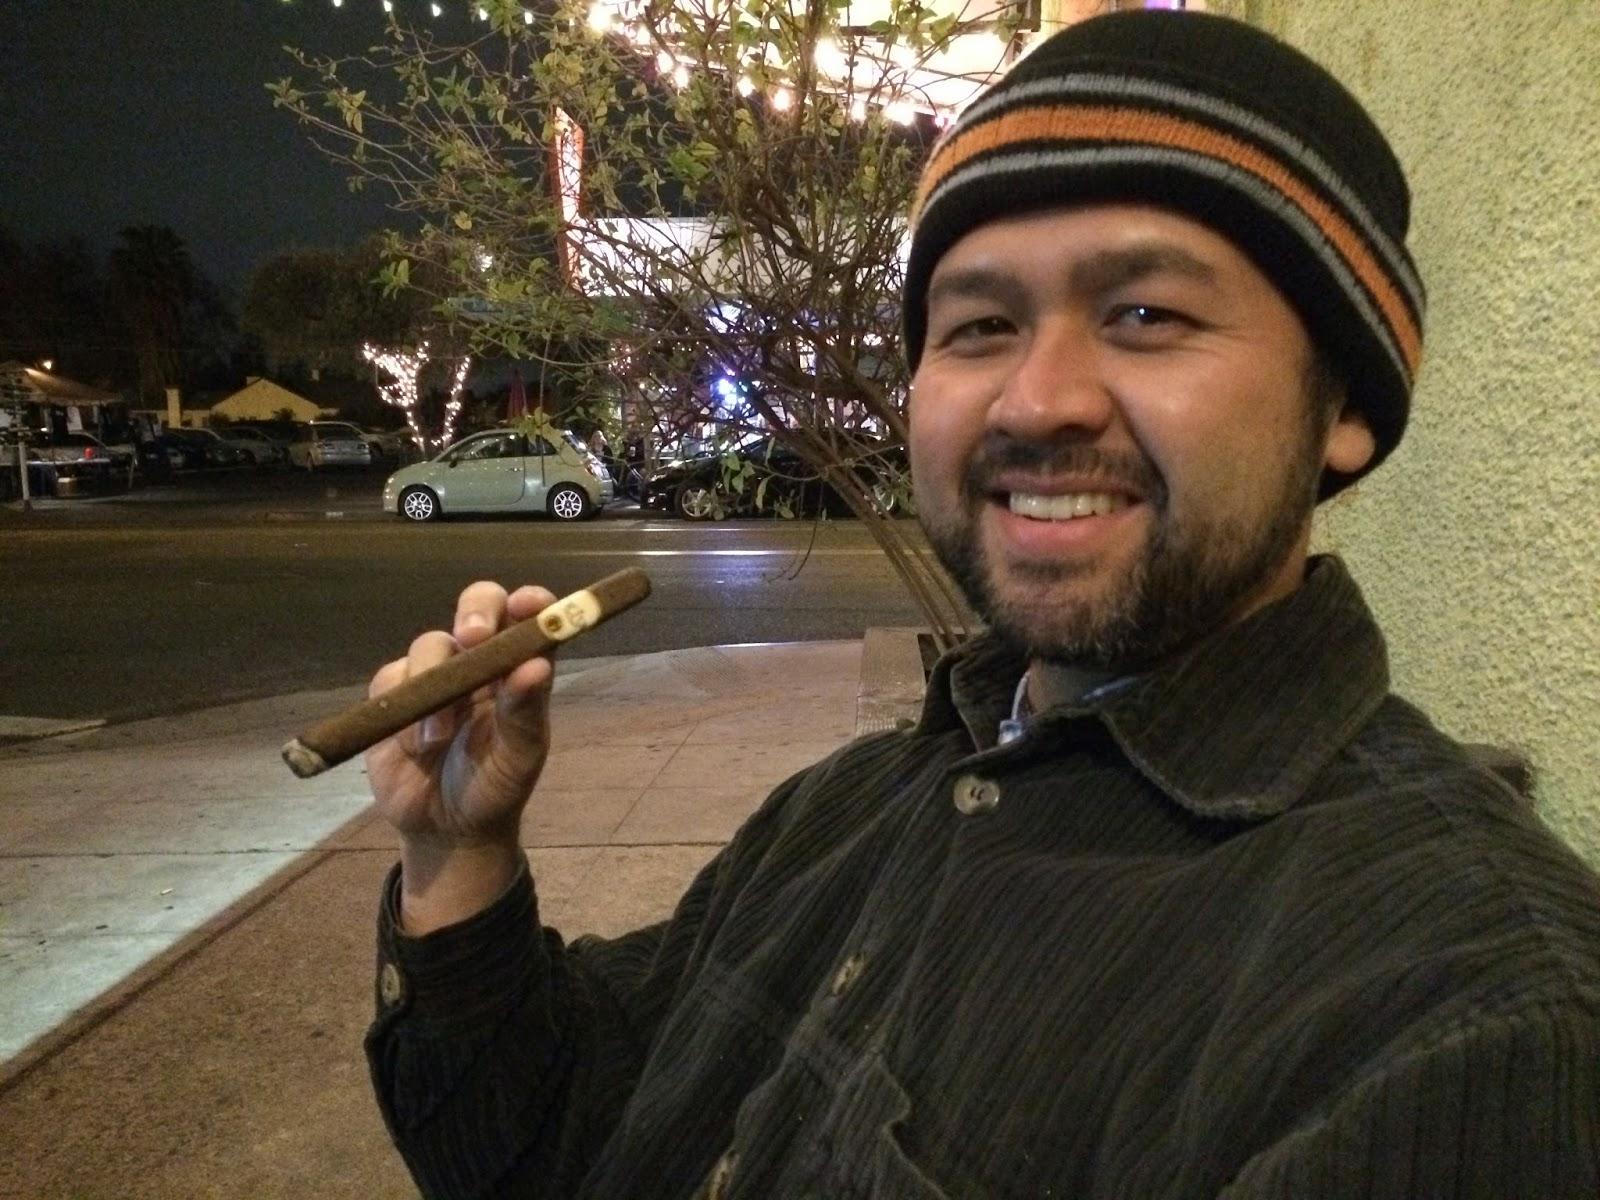 Oliva Serie G cigar 3